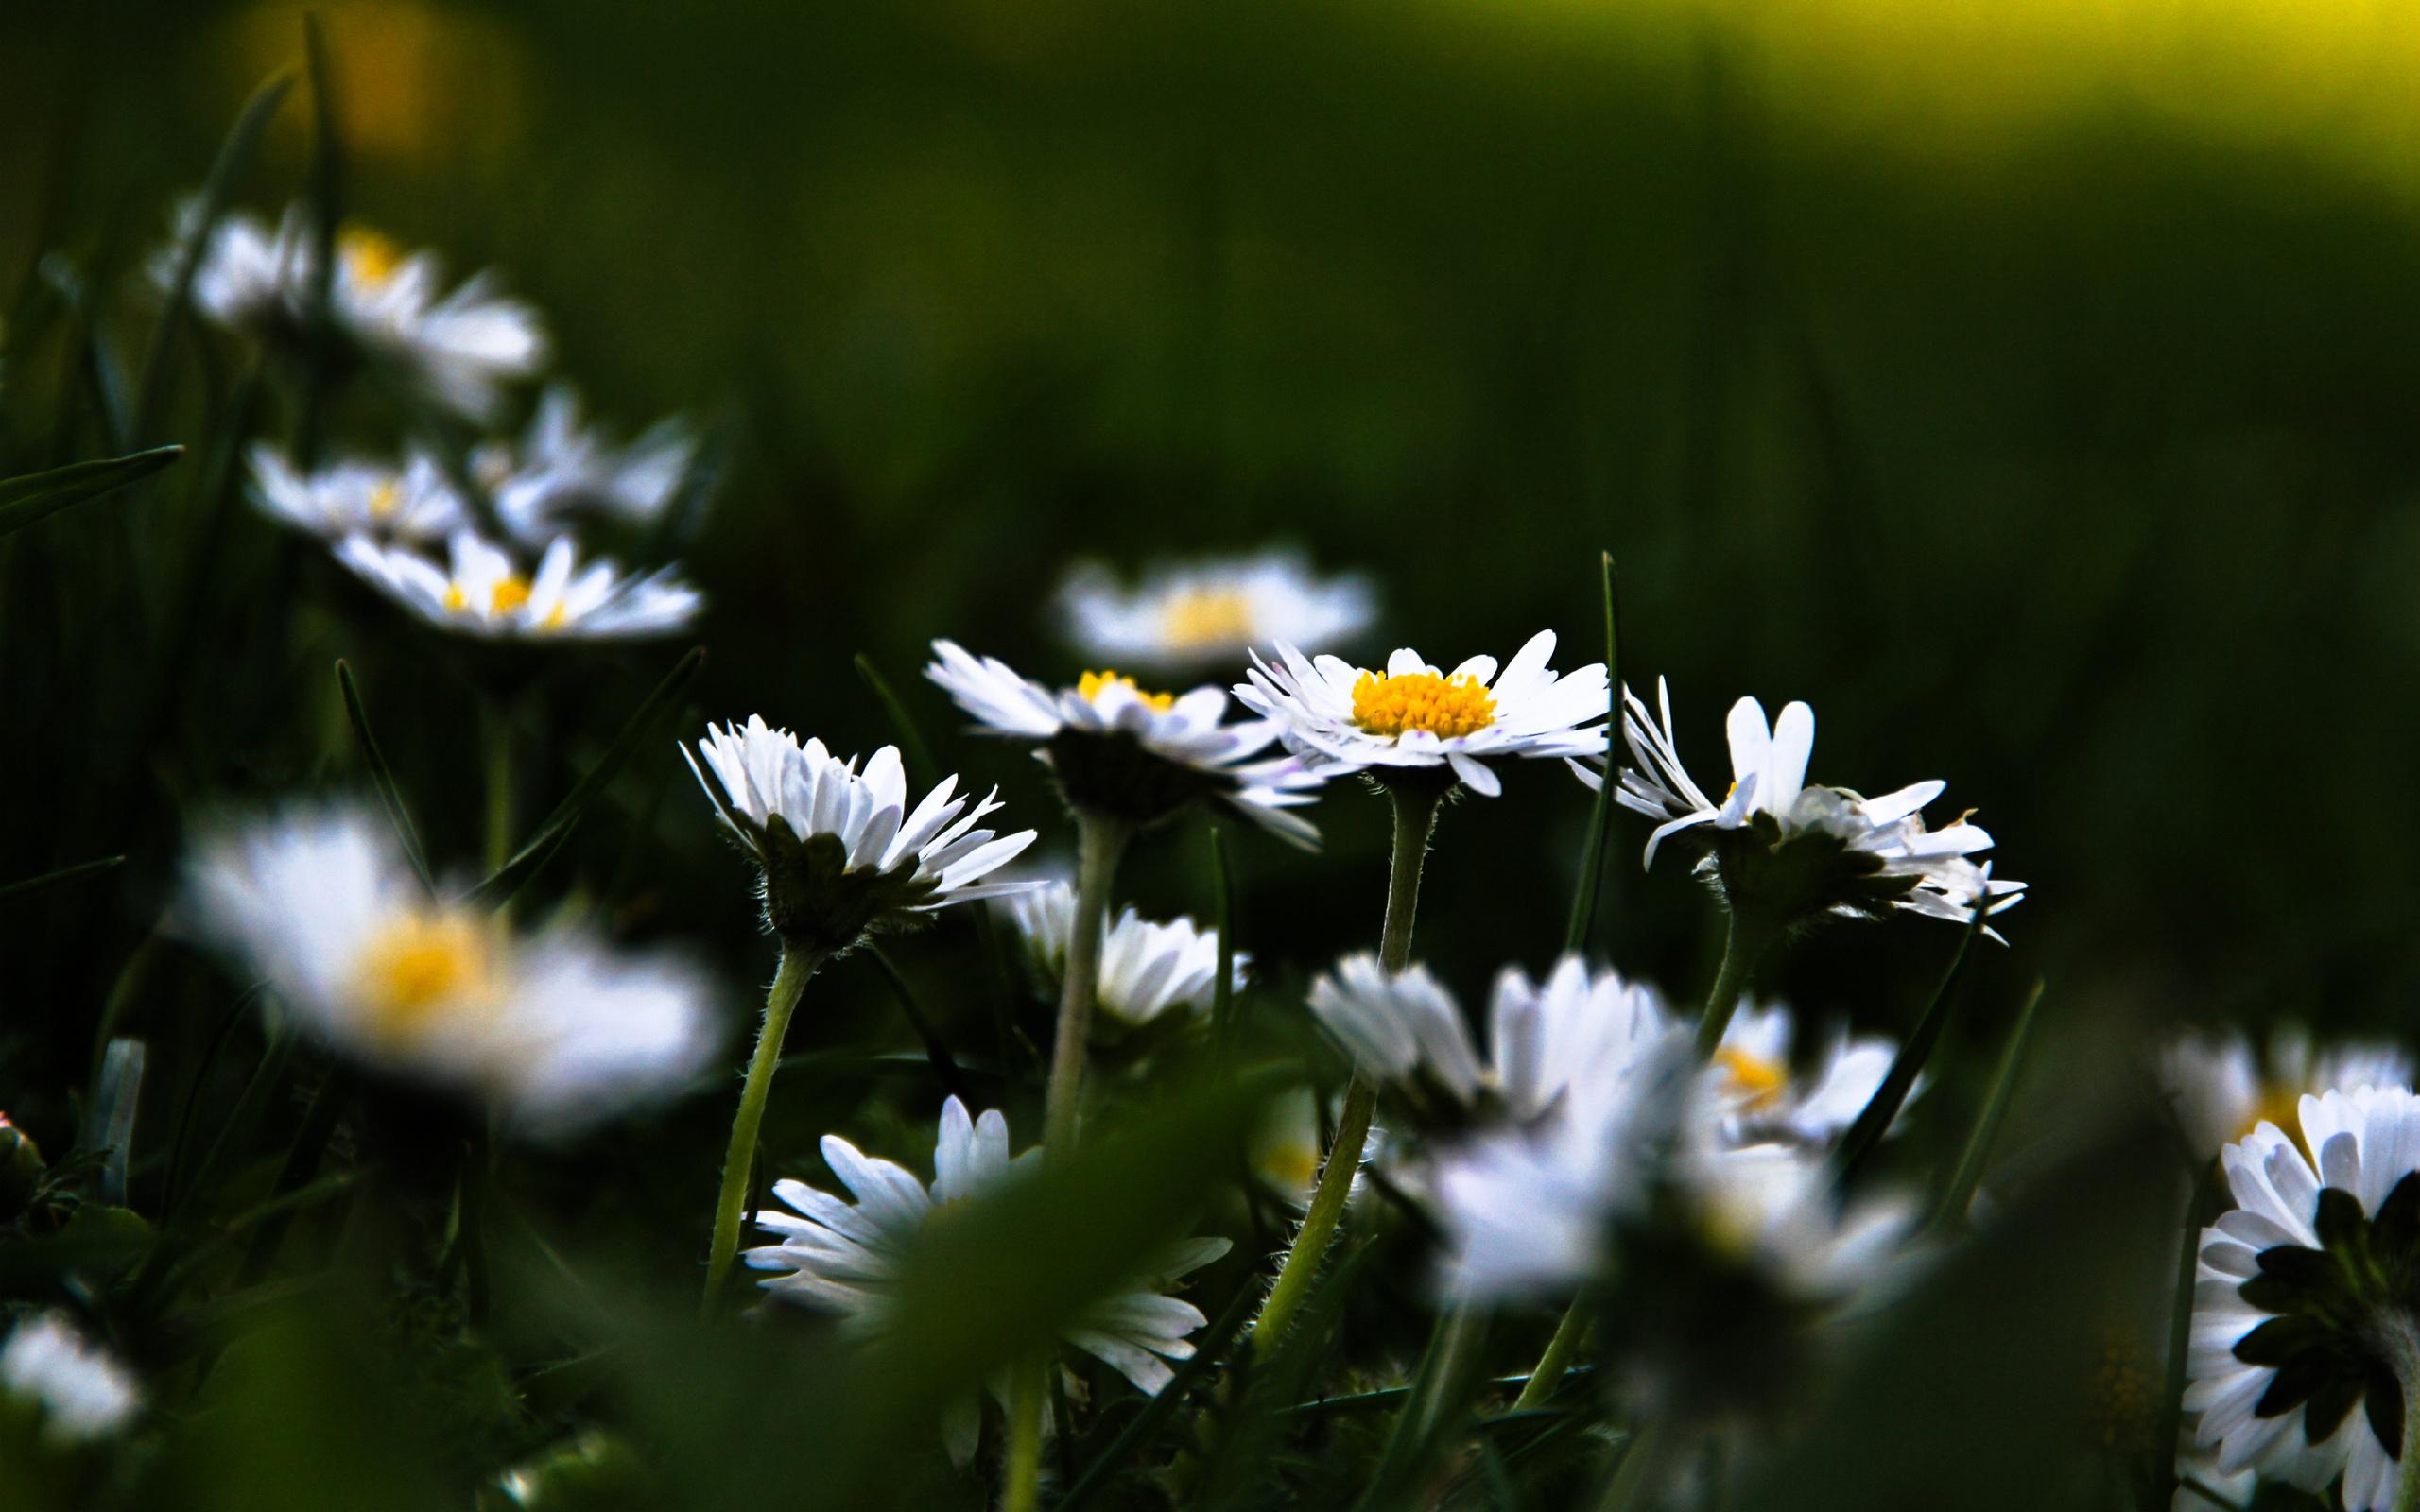 ромашки цветы трава бесплатно